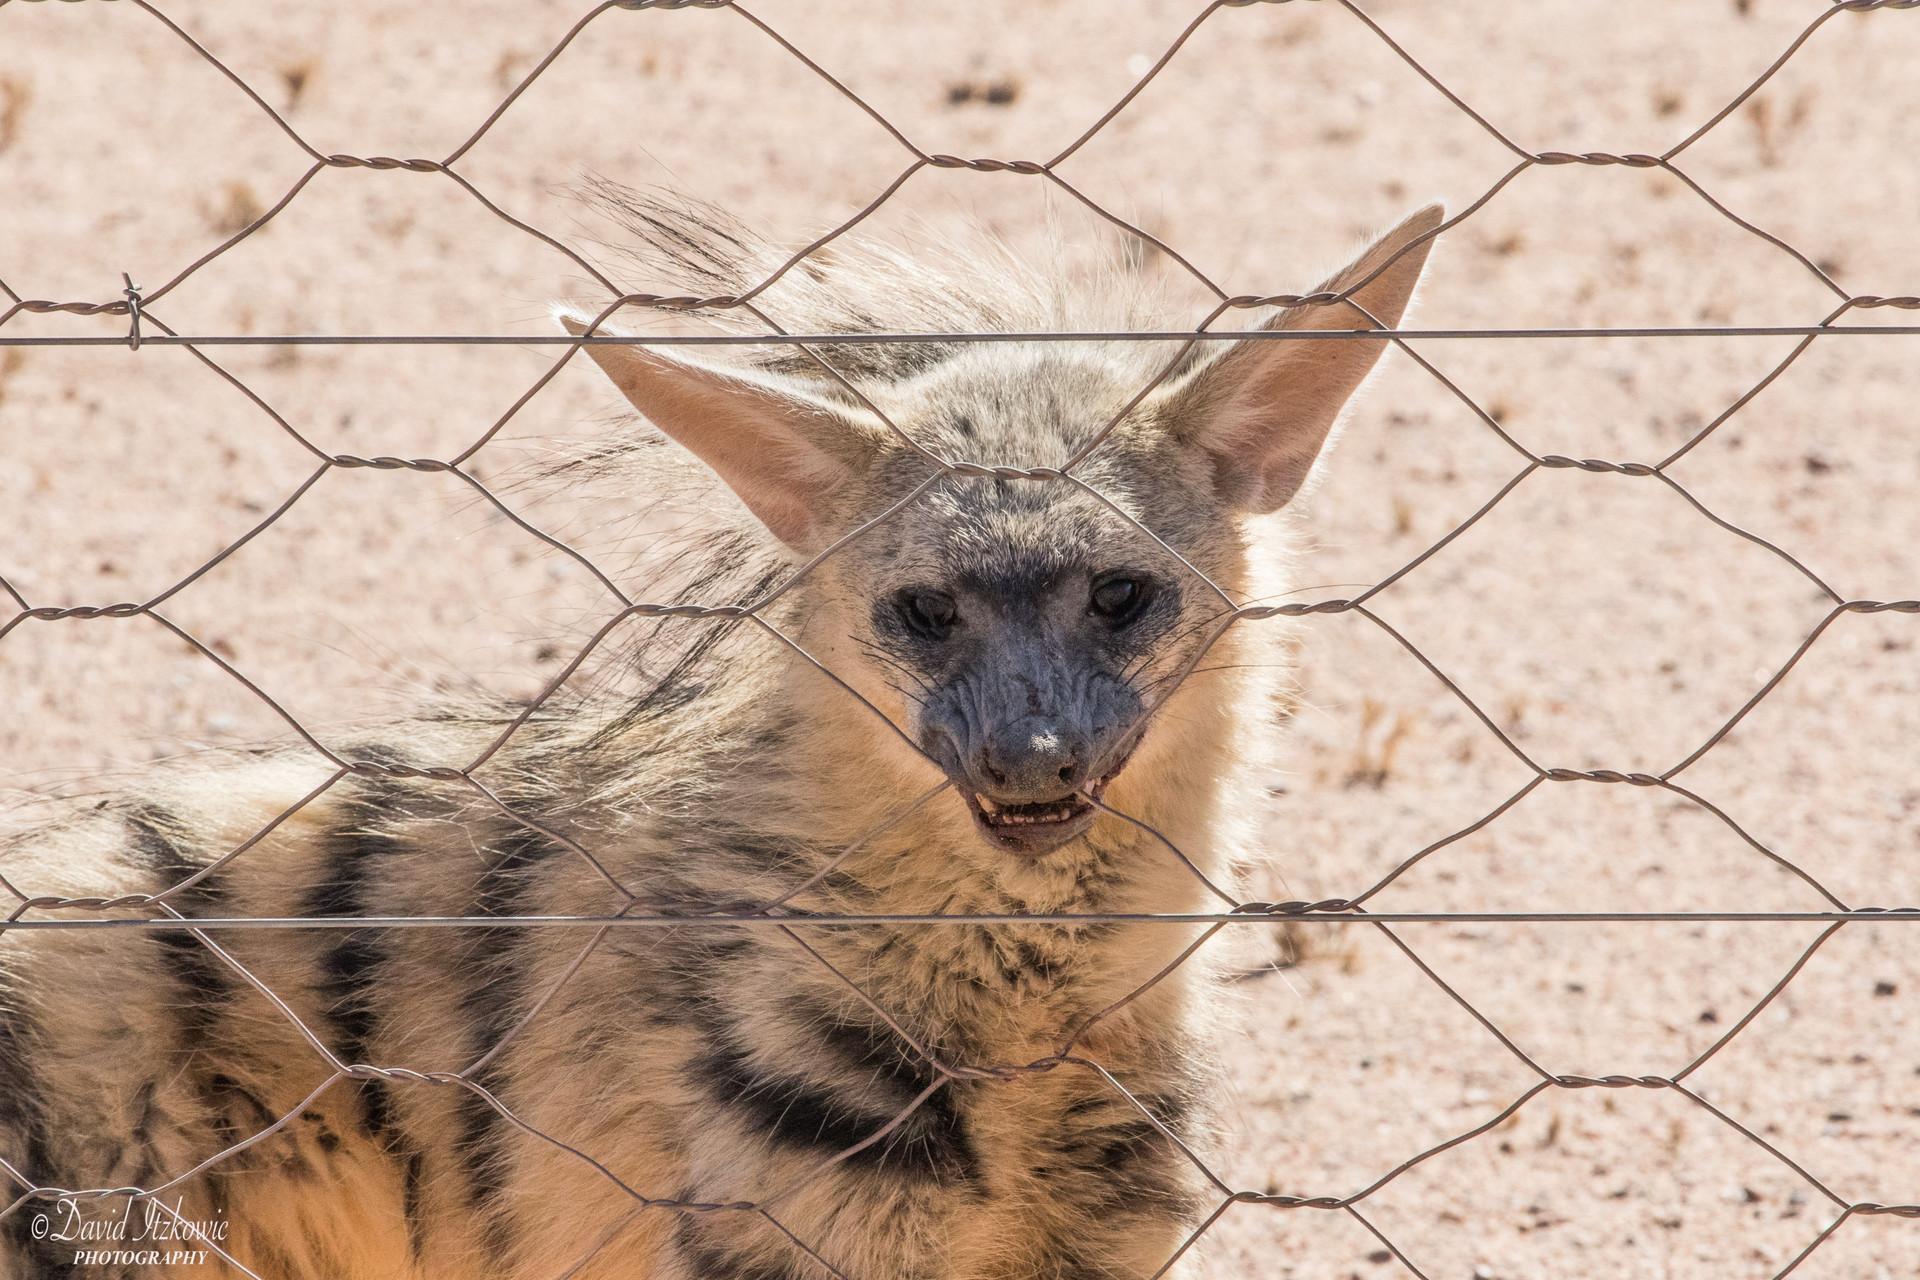 hyena biting the wire